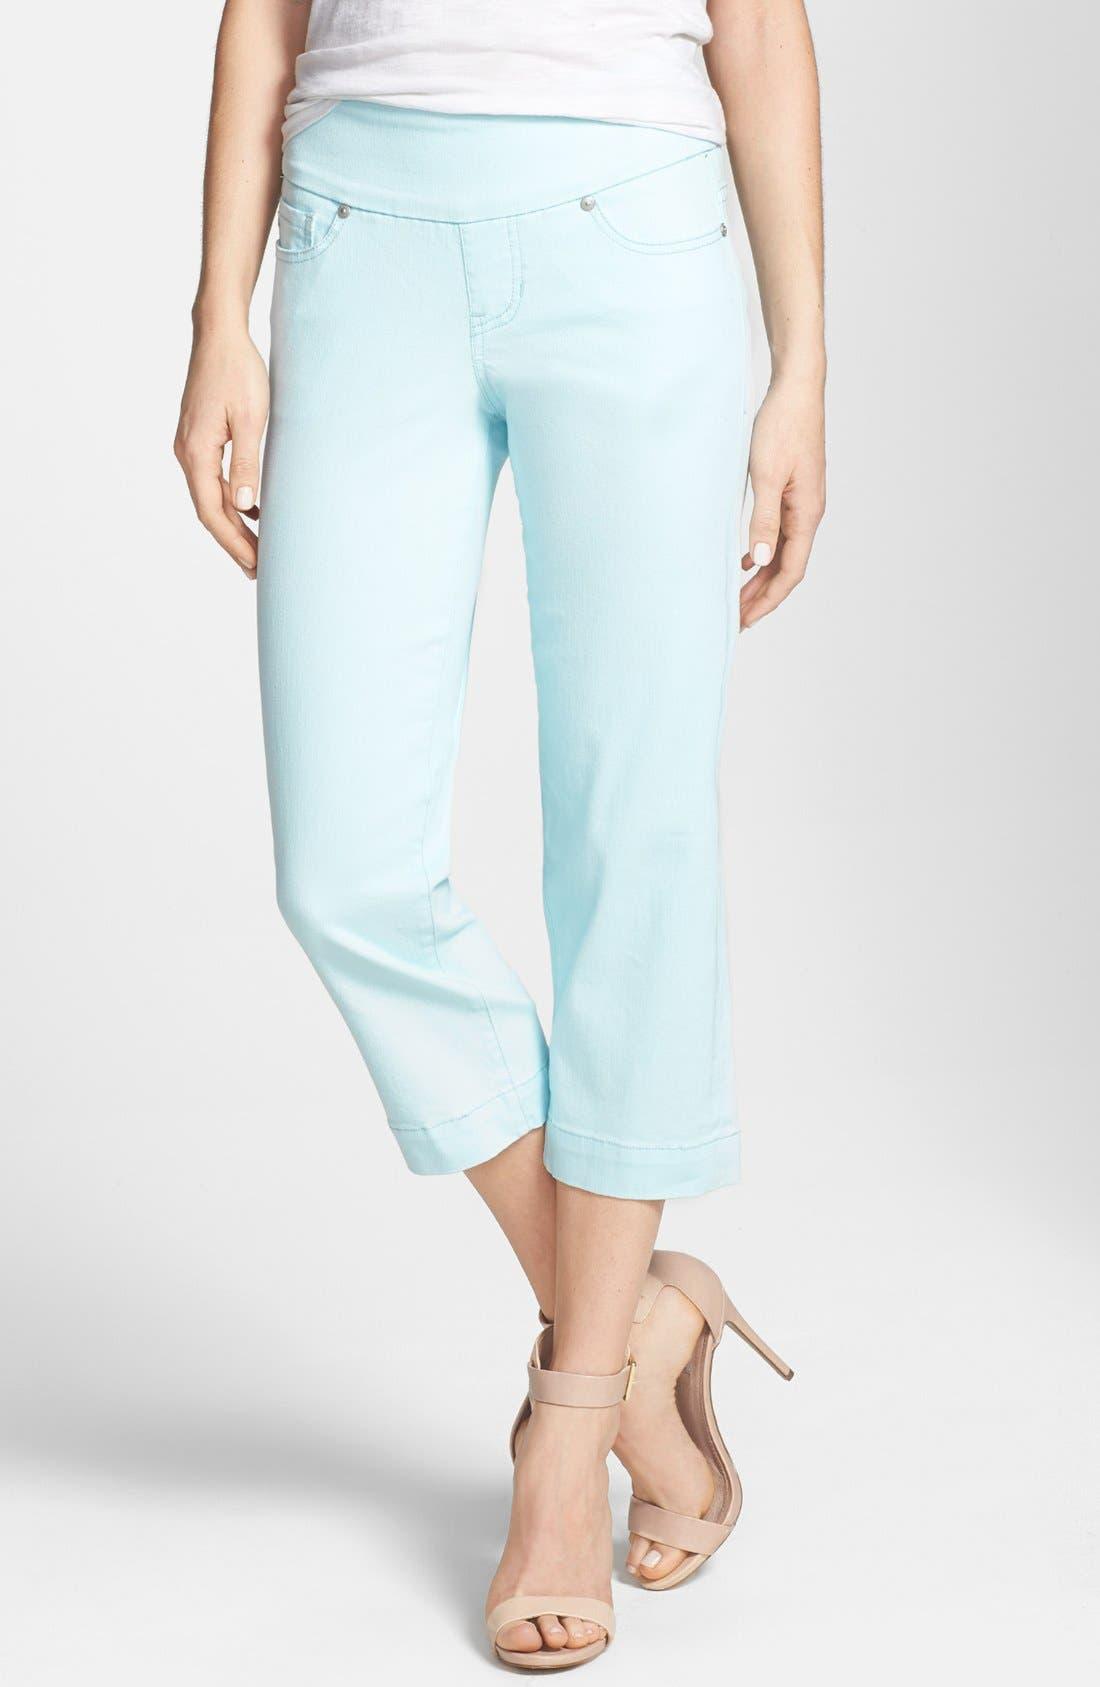 Alternate Image 1 Selected - Jag Jeans 'Felicia' Crop Stretch Denim Jeans (Petite)